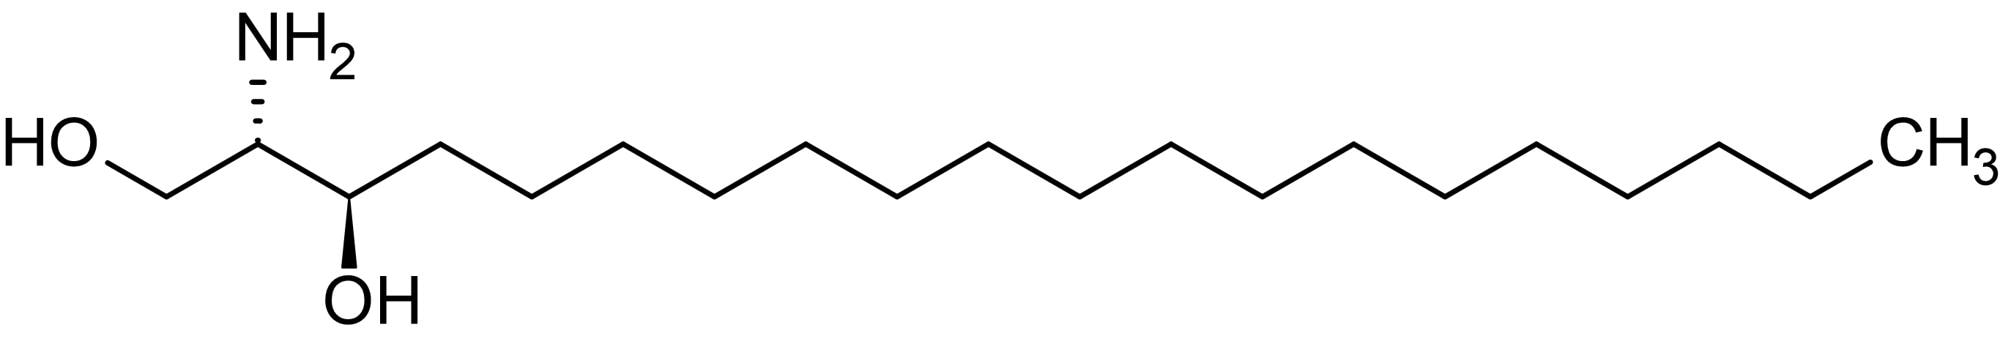 Chemical Structure - D-erythro-C20-Dihydrosphingosine, Ceramide biosynthesis intermediate (ab144093)